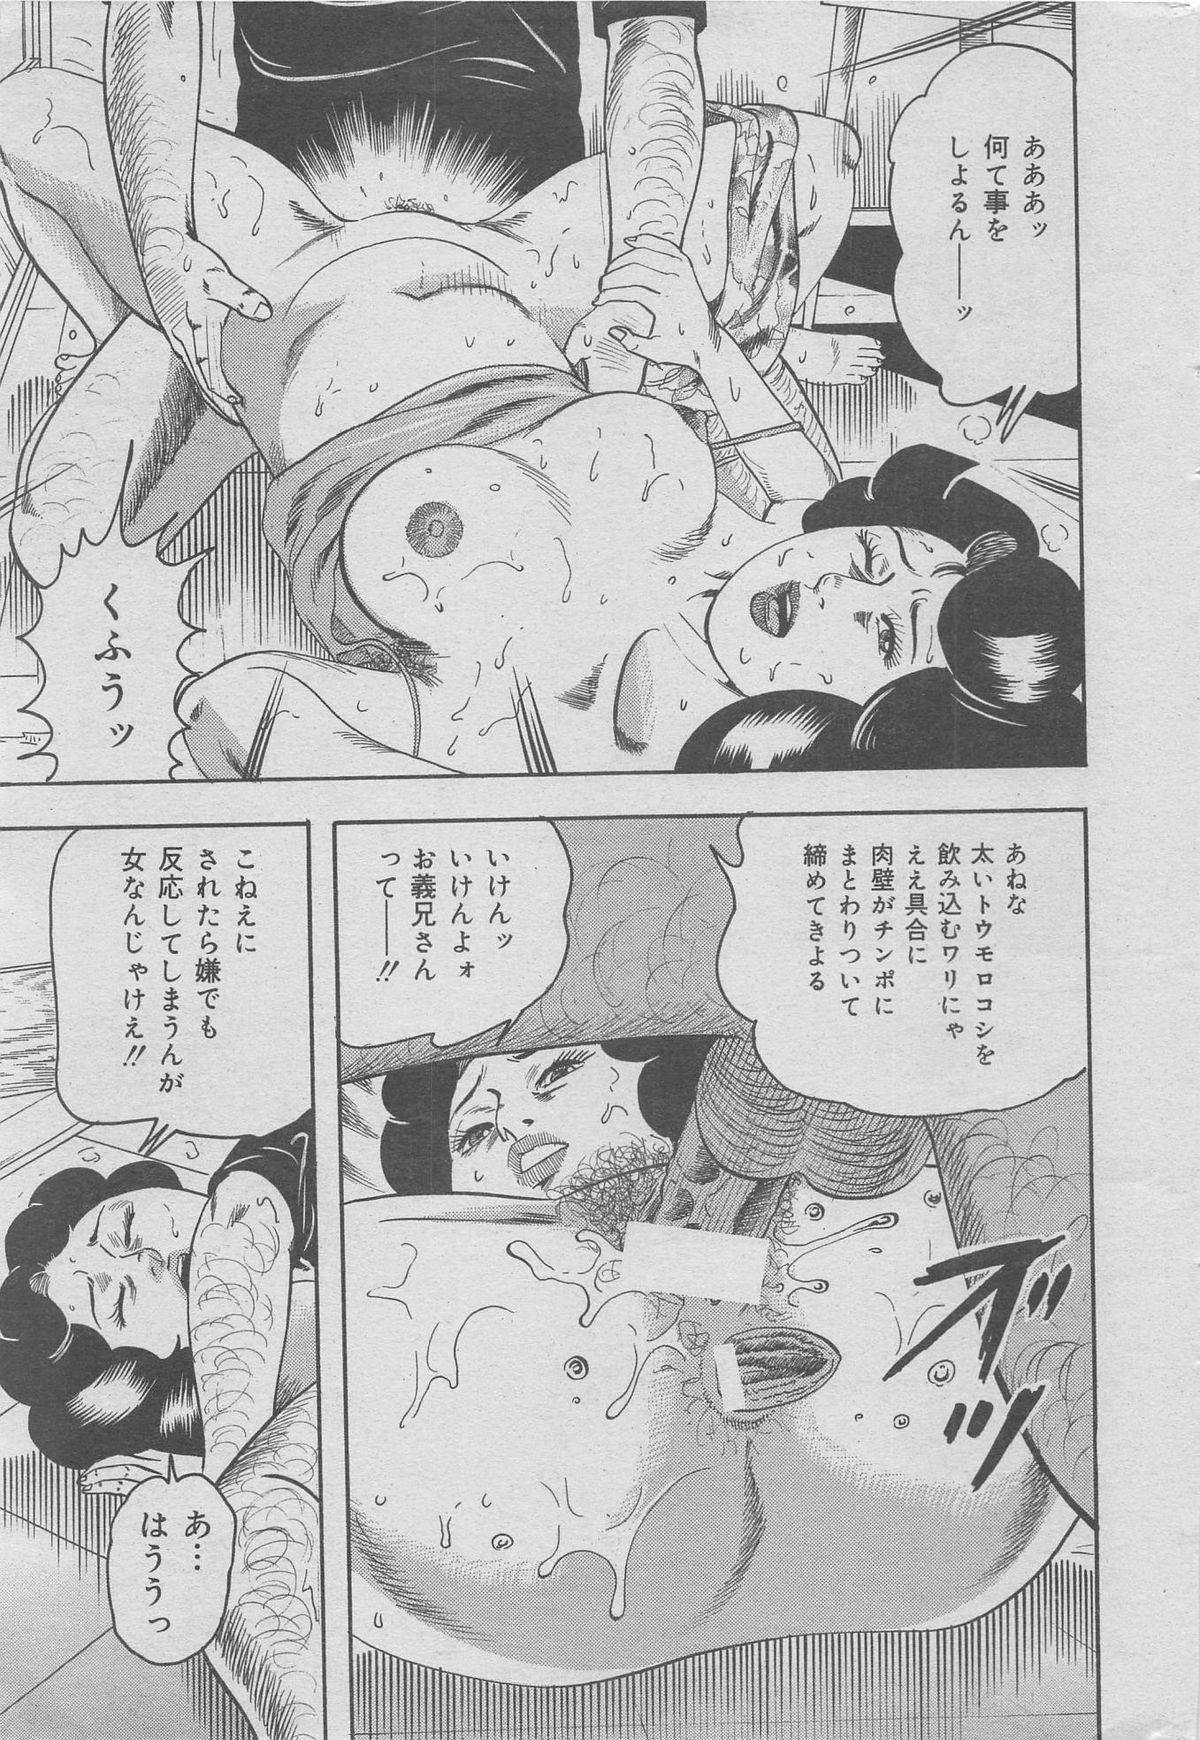 Hontou ni Atta Kindanai vol.7 14